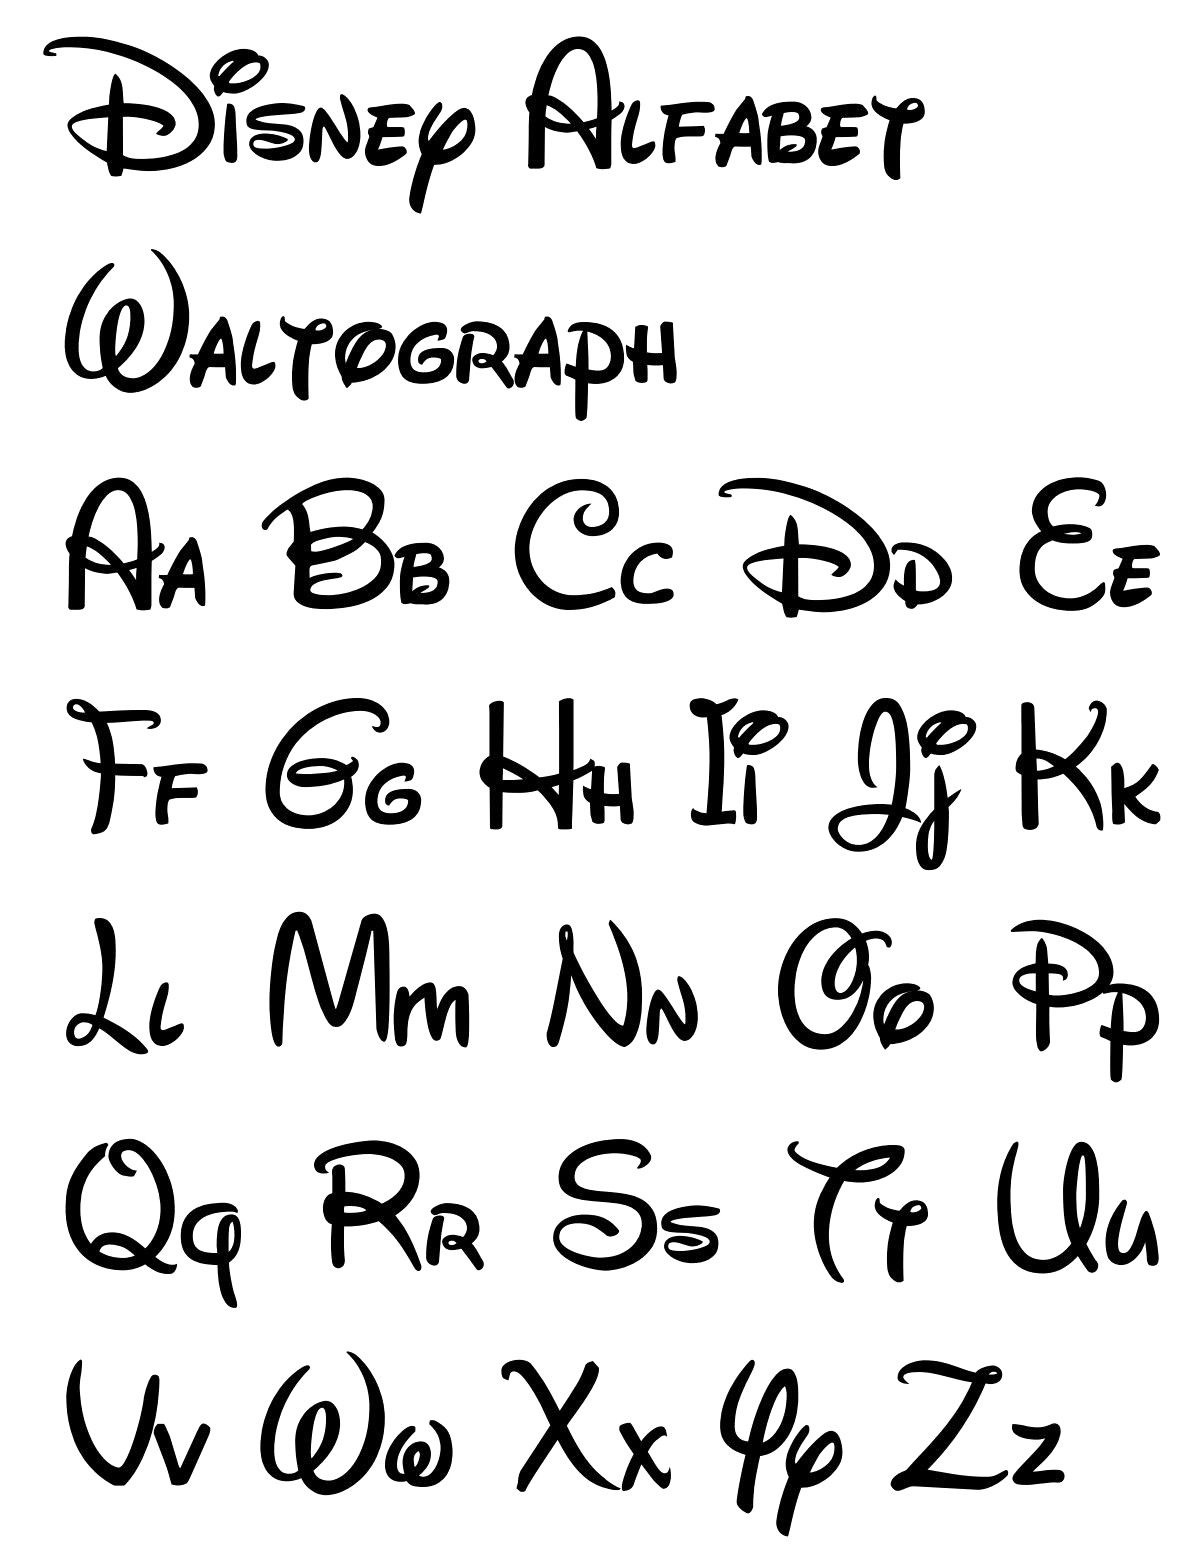 Free Printable Disney Letter Stencils | Disney/dreamworks In 2019 - Free Printable Calligraphy Letter Stencils